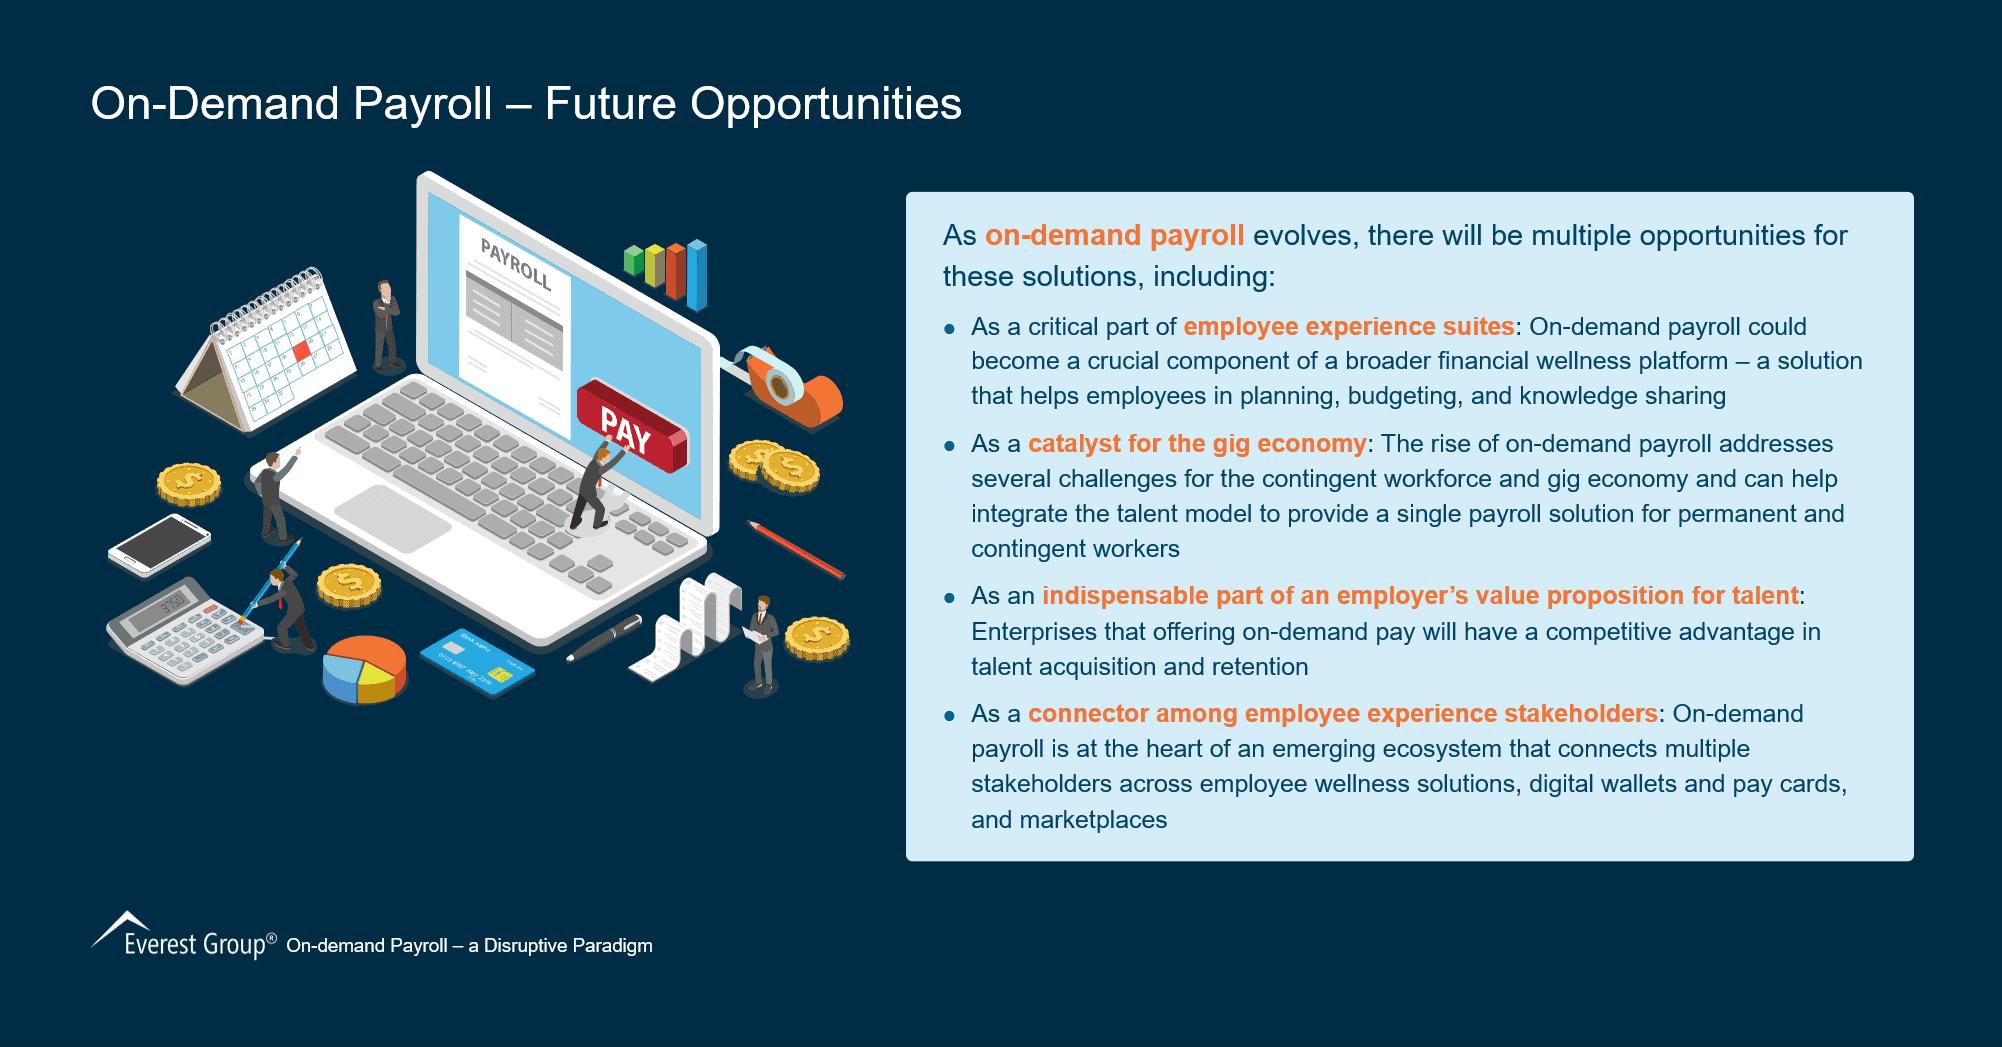 On-Demand Payroll – Future Opportunities